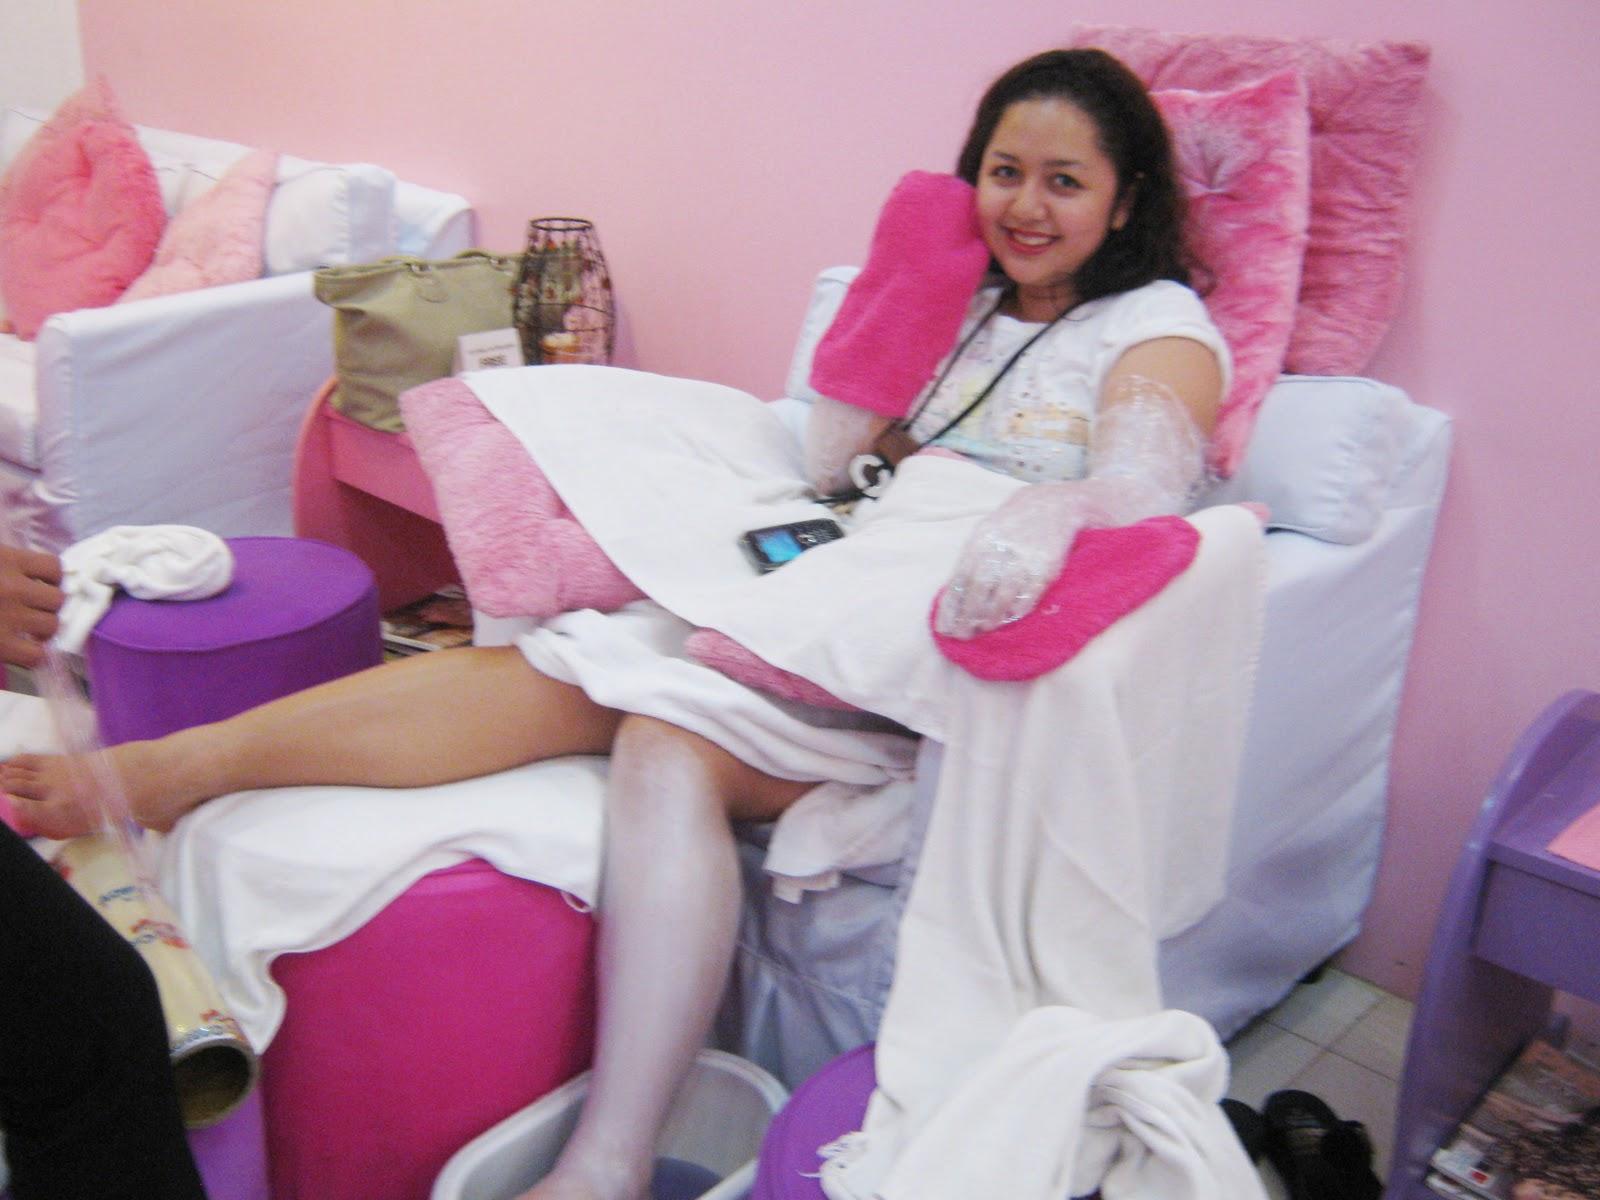 My Posh Nails Fetish Experience ~ LovingSunshine - a Beauty Blogger ...